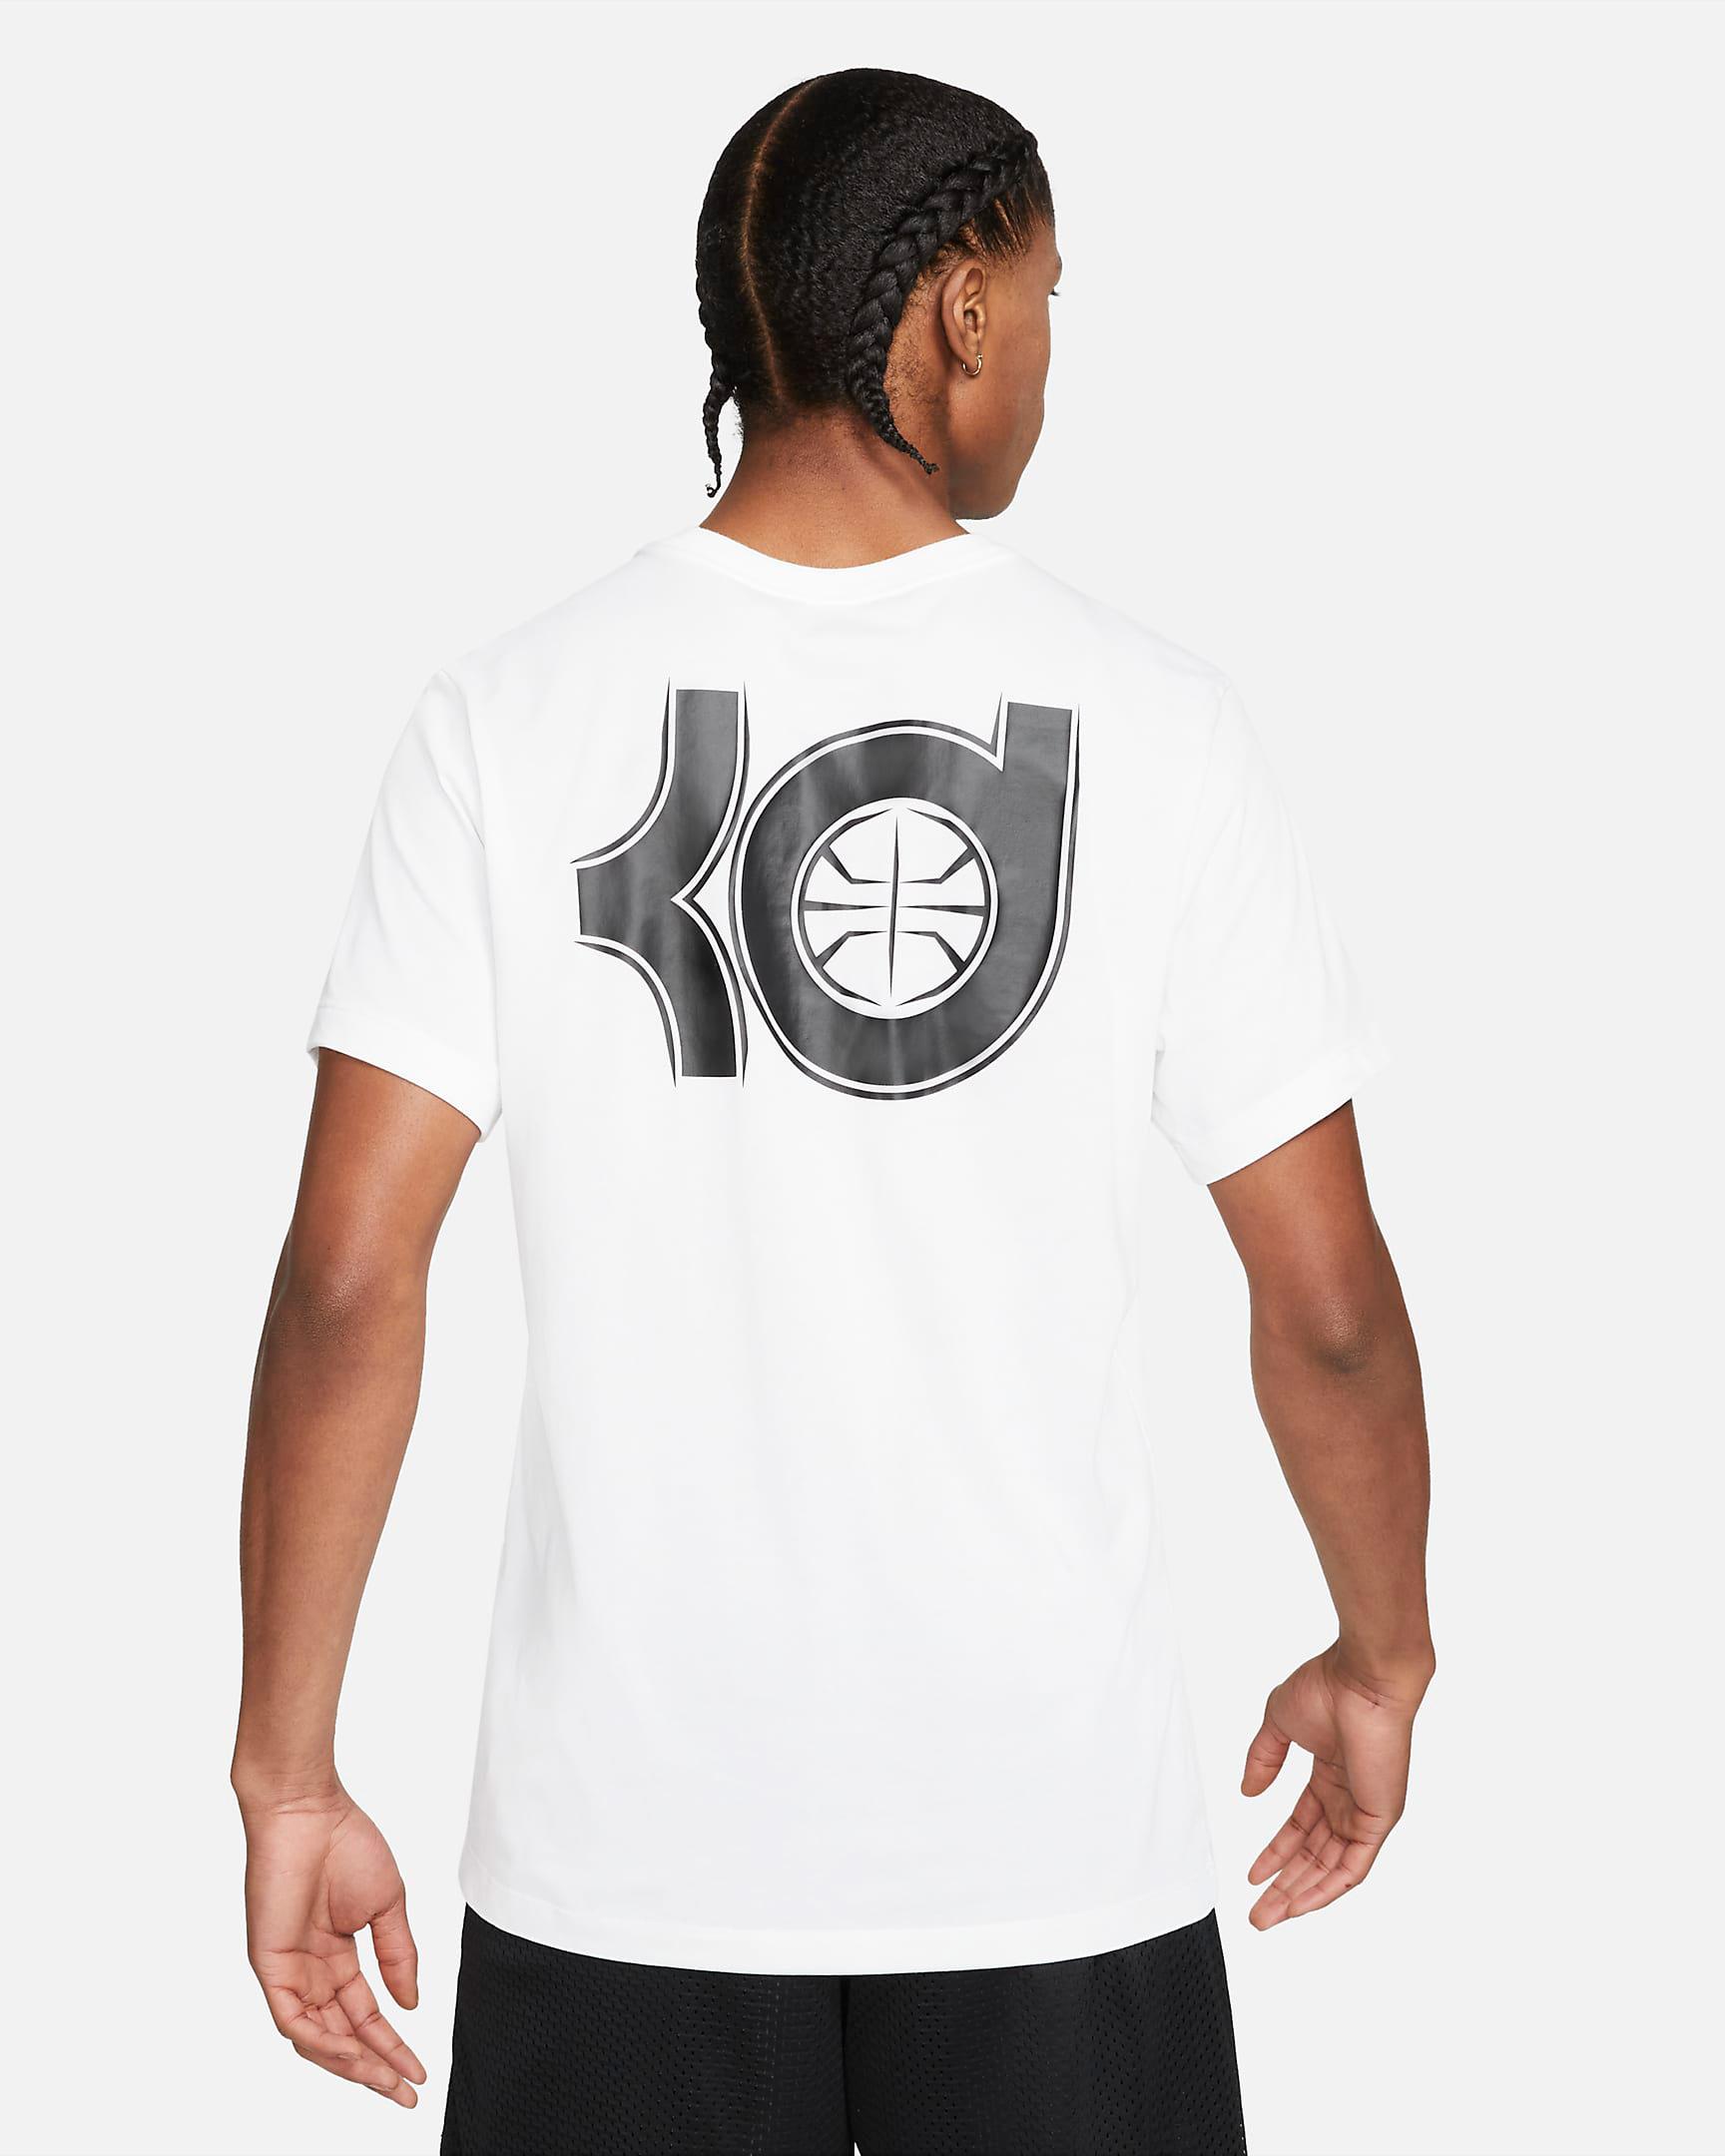 nike-kd-14-shirt-white-black-2